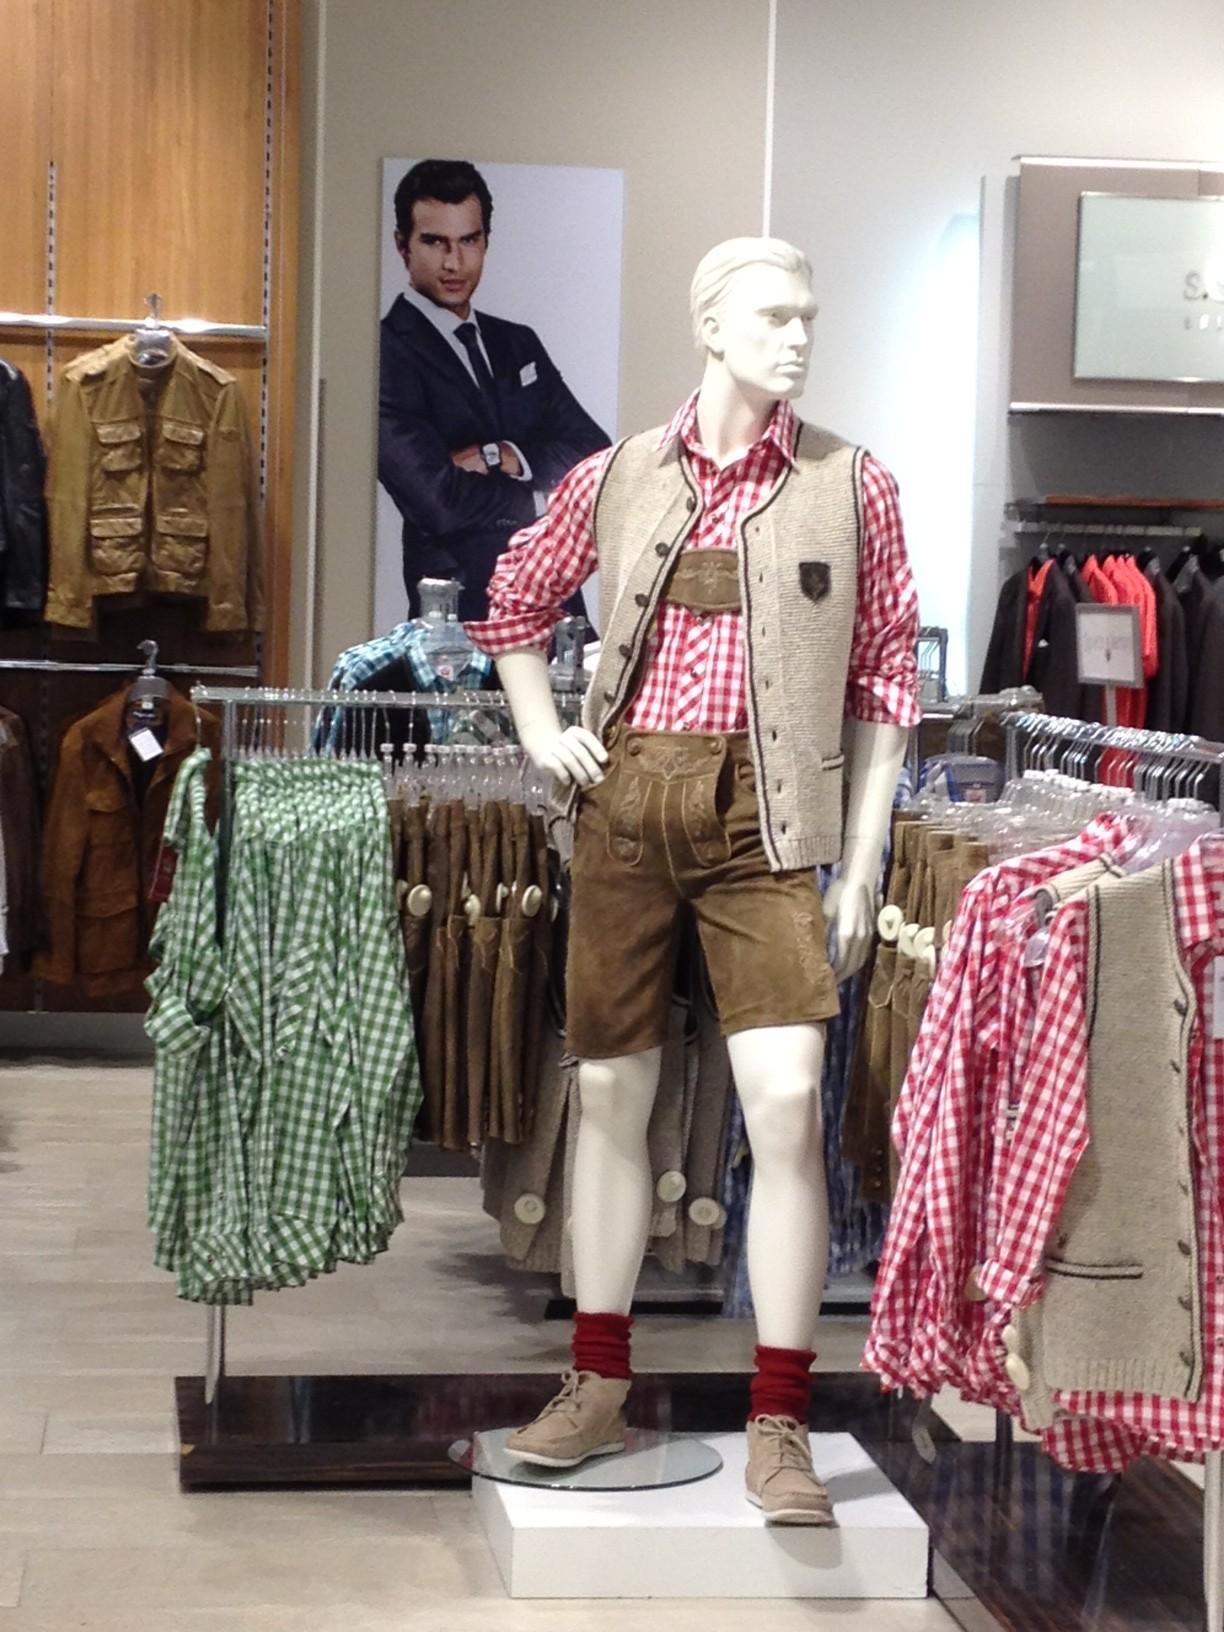 Lederhosen for Sale in Department Store - Savannah Page